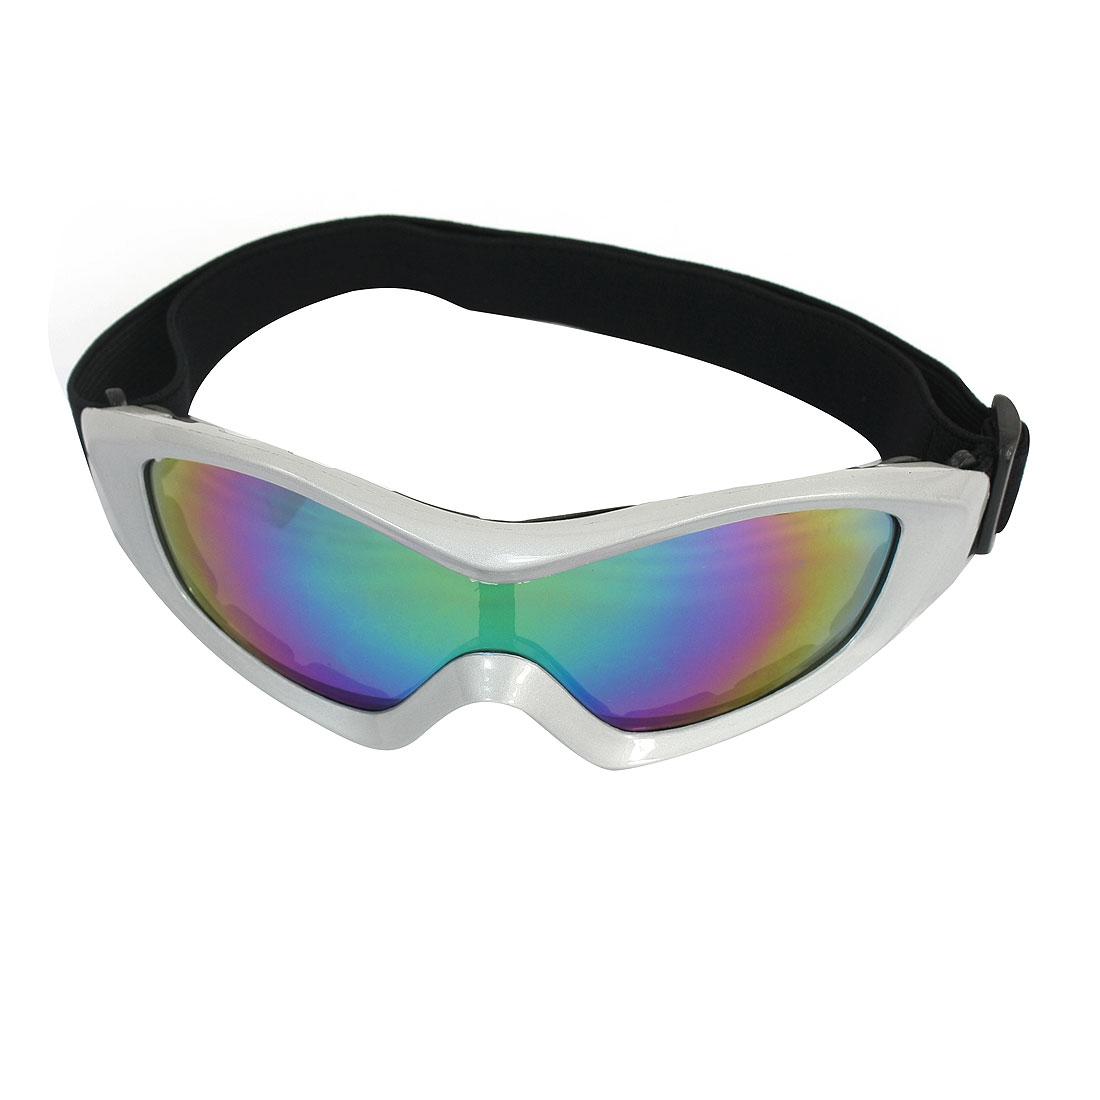 Motorcycle Bike Racing Full Rim Eyewear Protecting Glasses Ski Goggles by